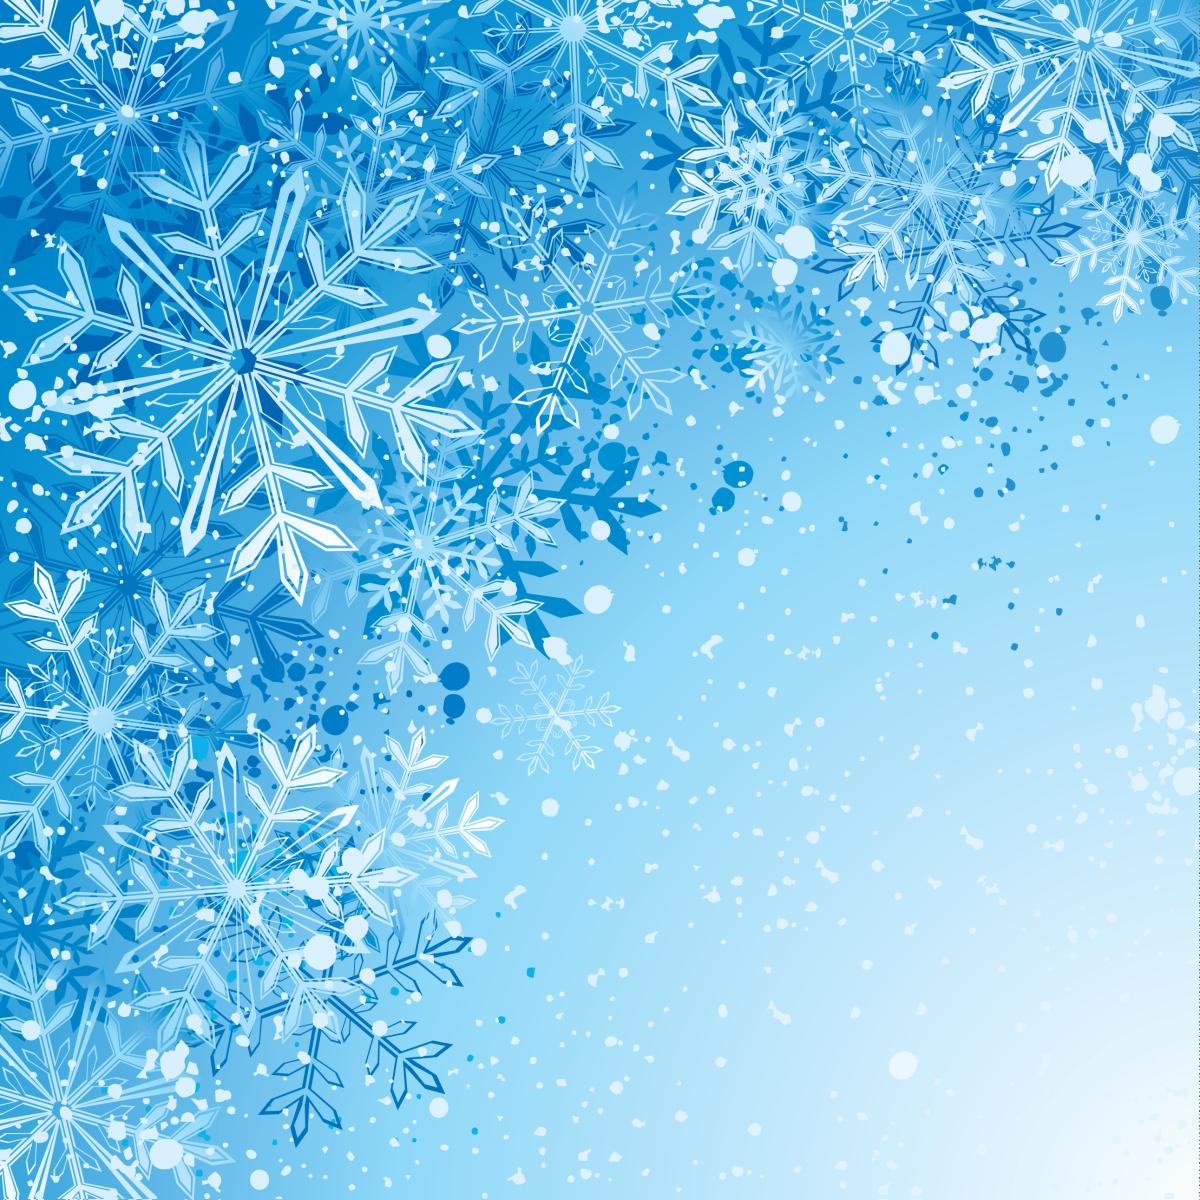 зимний новогодний фон 12